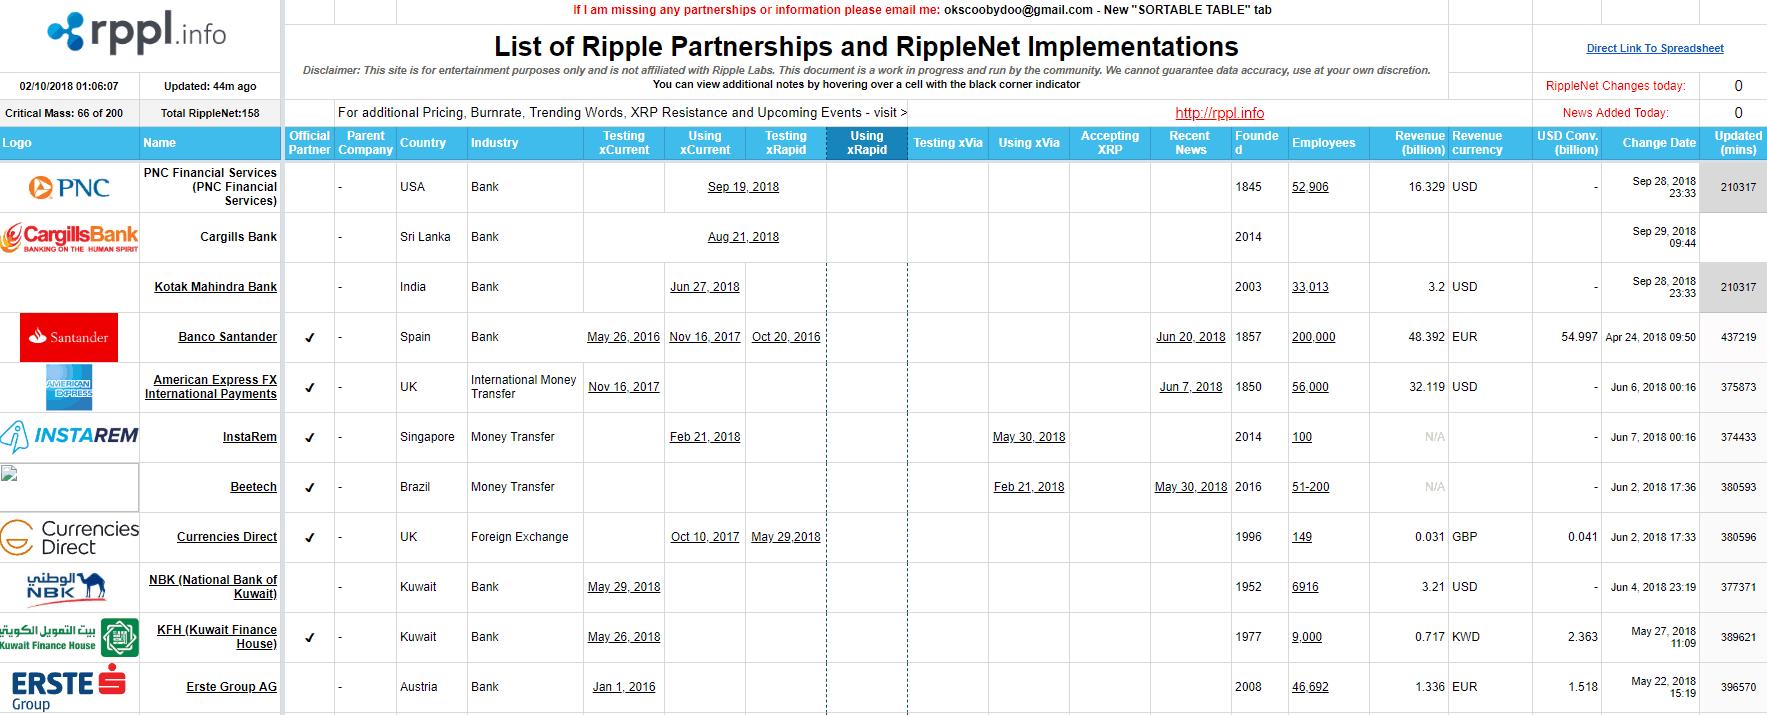 Ripple Partnerships